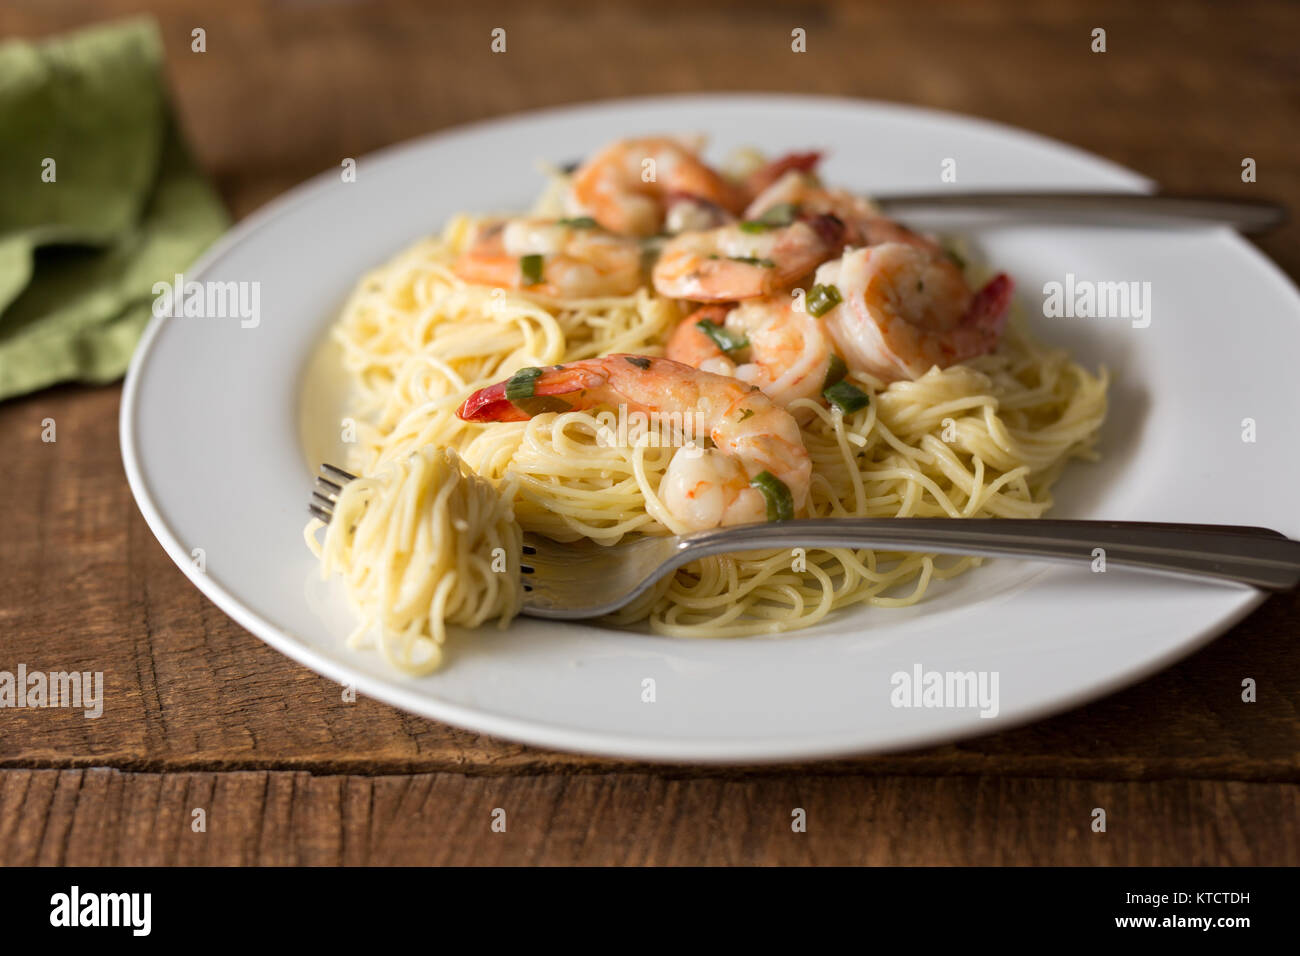 Close Up Shot Of A White Plate Filled With Shrimp Scampi Shrimp